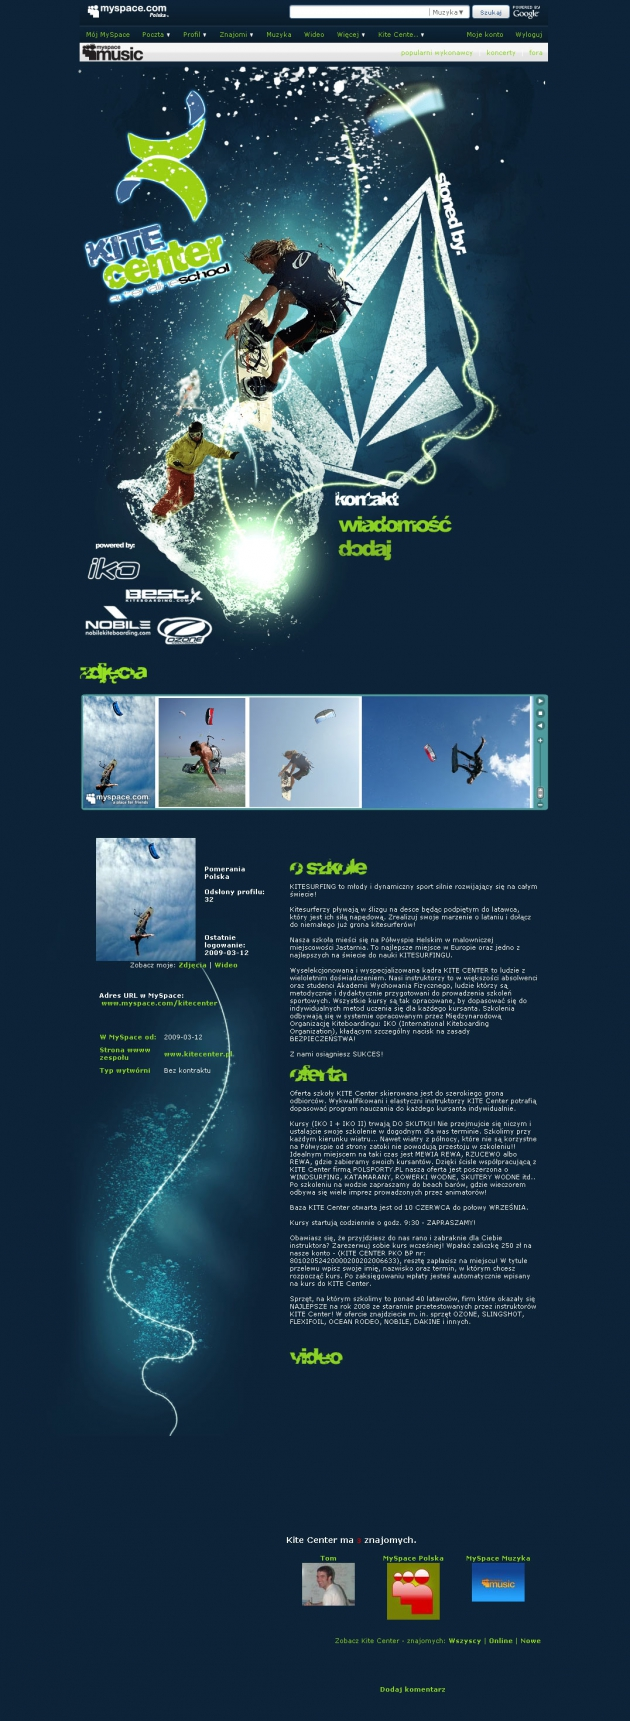 Kite Center Myspace Layout